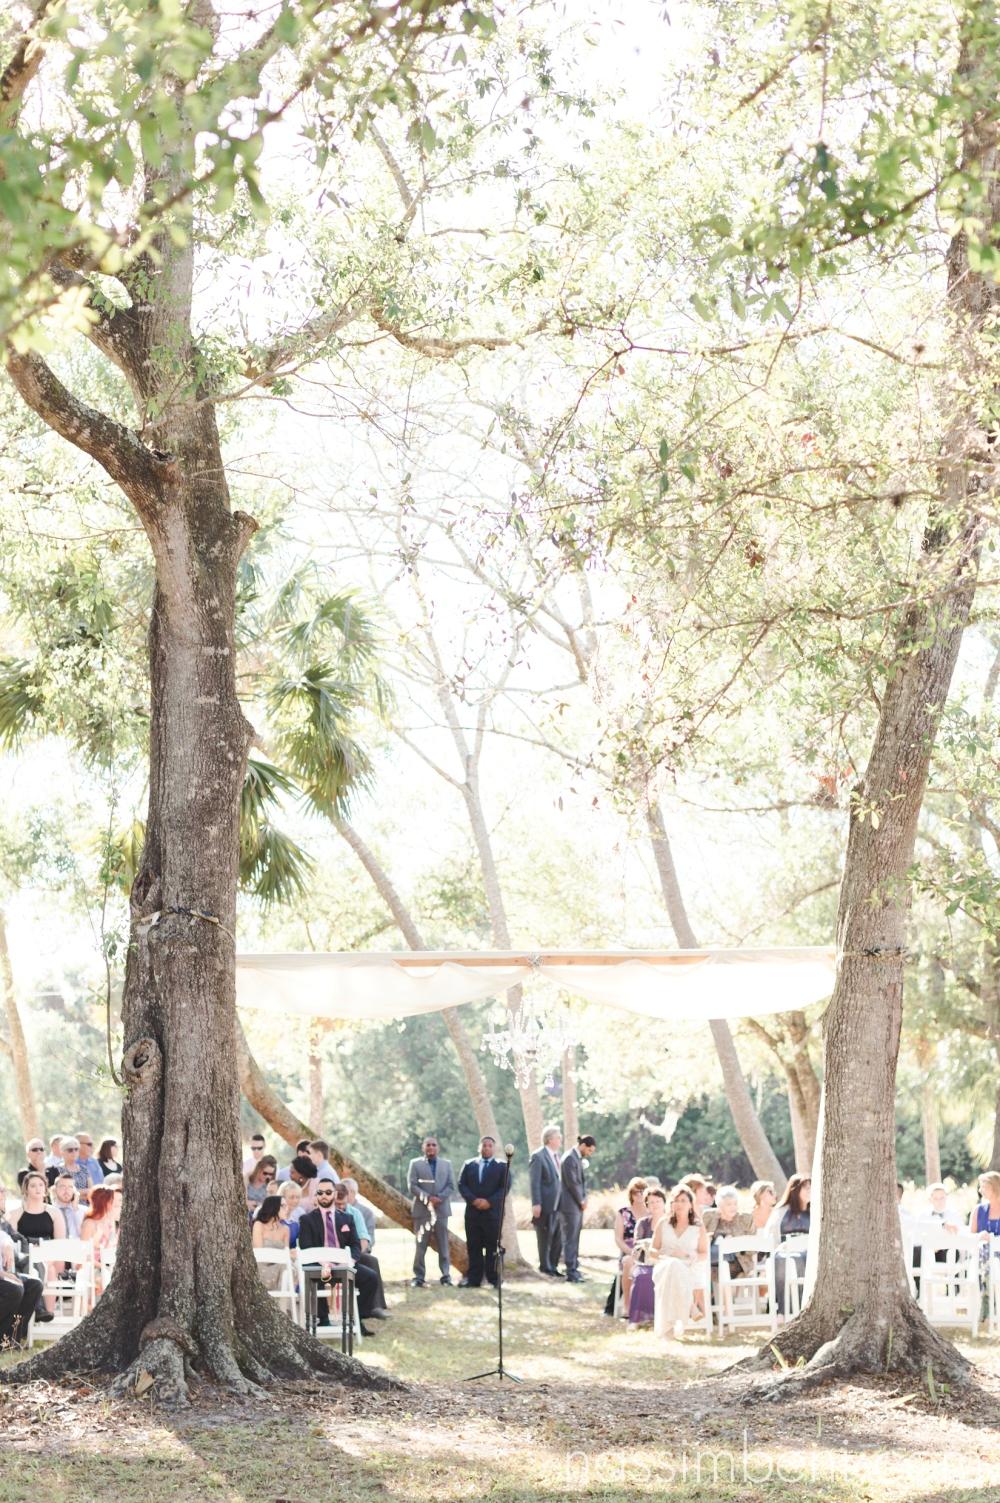 light-and-airy-port-st-lucie-wedding-photographer-nassimbeni-photography-15